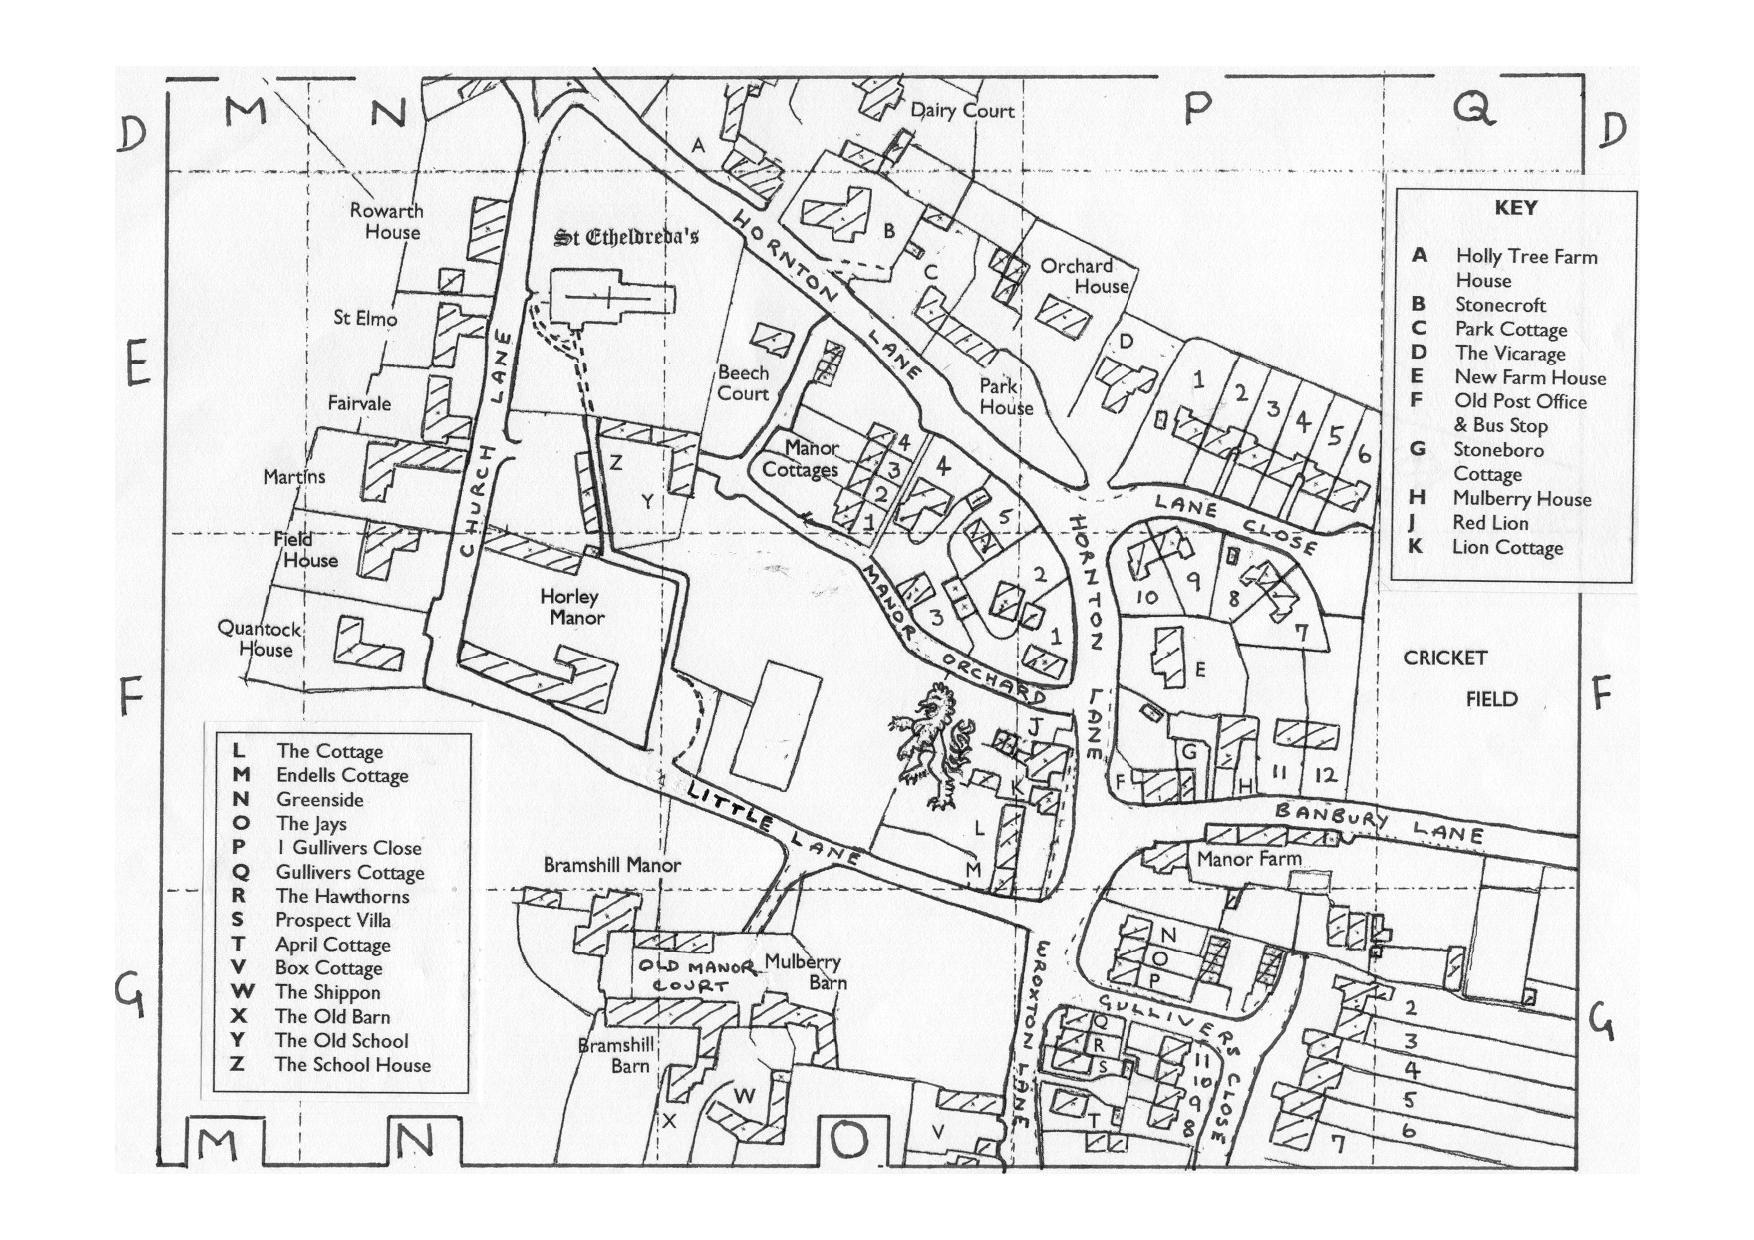 Banbury England Map.Village Maps Thehorleyviews Com